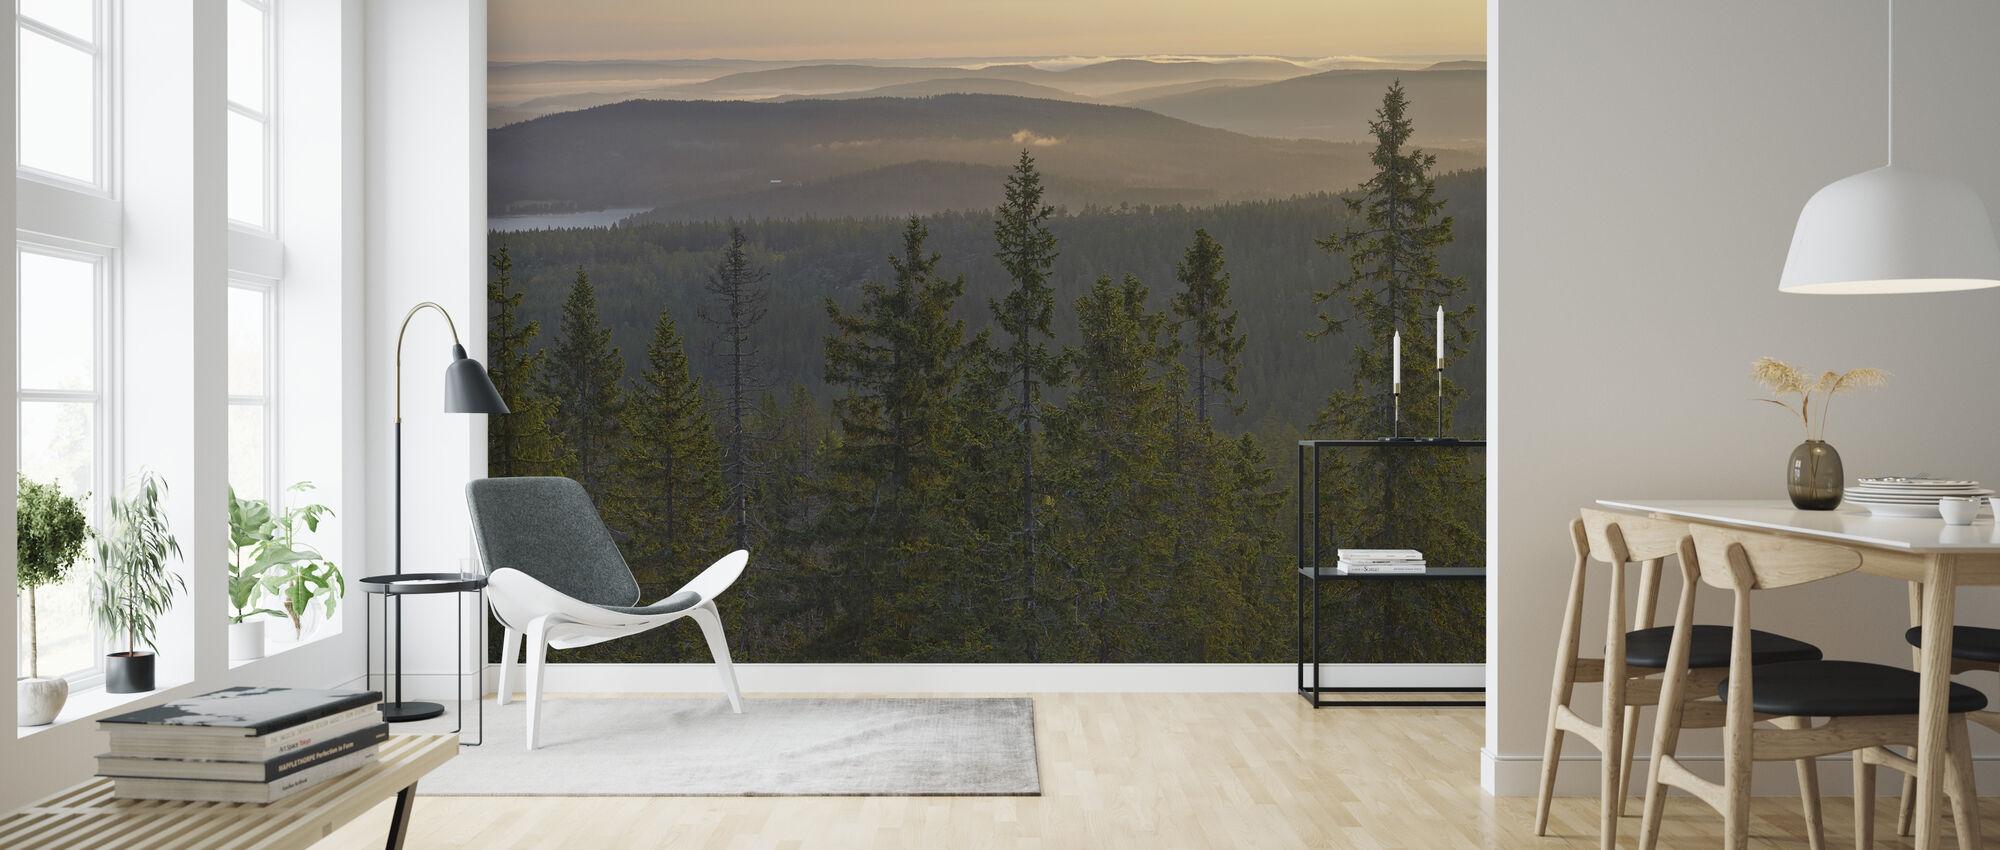 Skuleskogen National Park Spruces, Zweden - Behang - Woonkamer